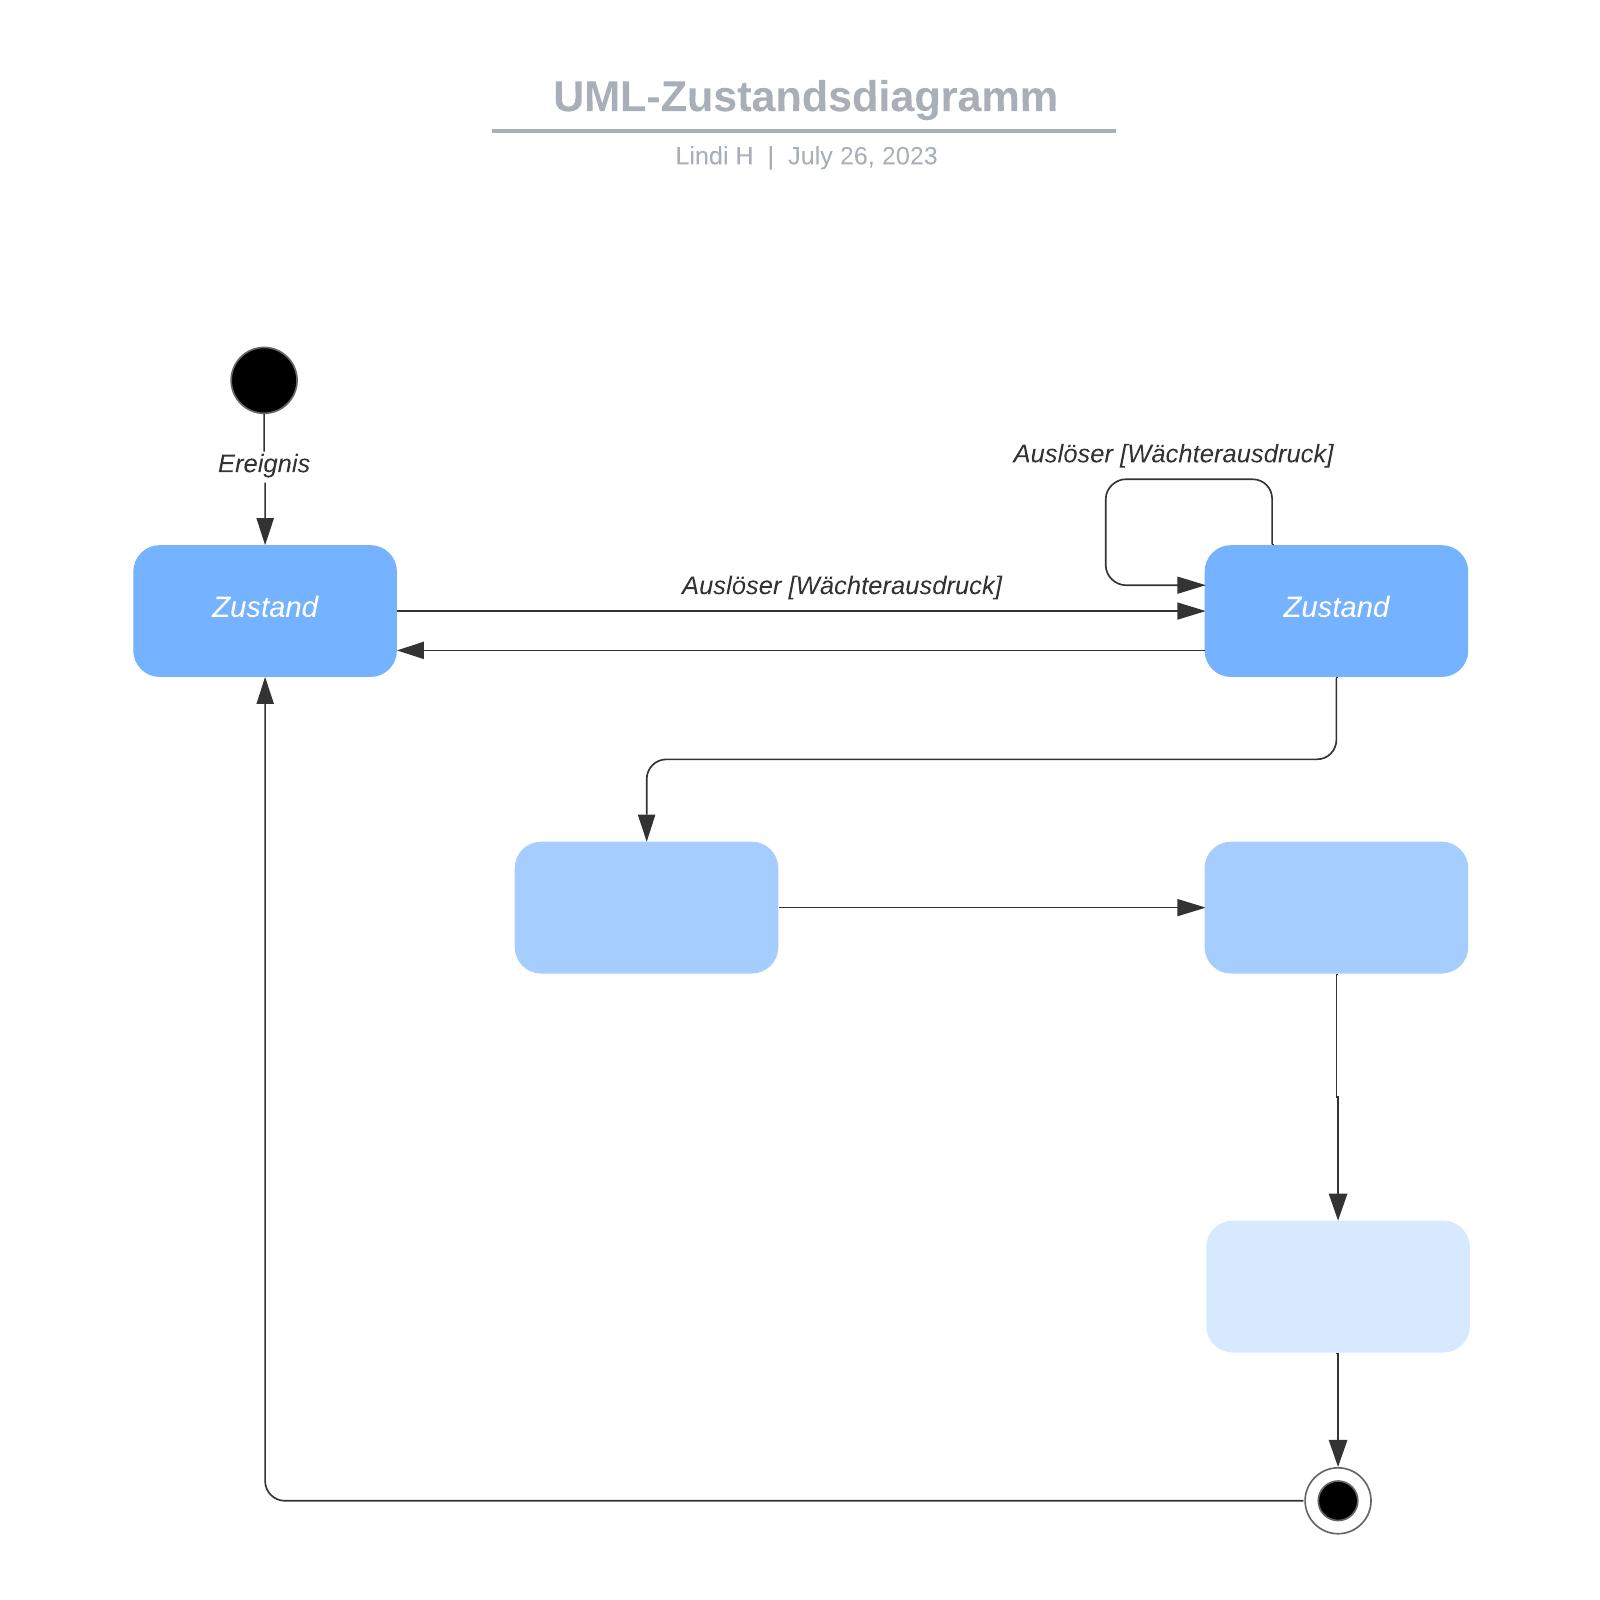 UML-Zustandsdiagramm